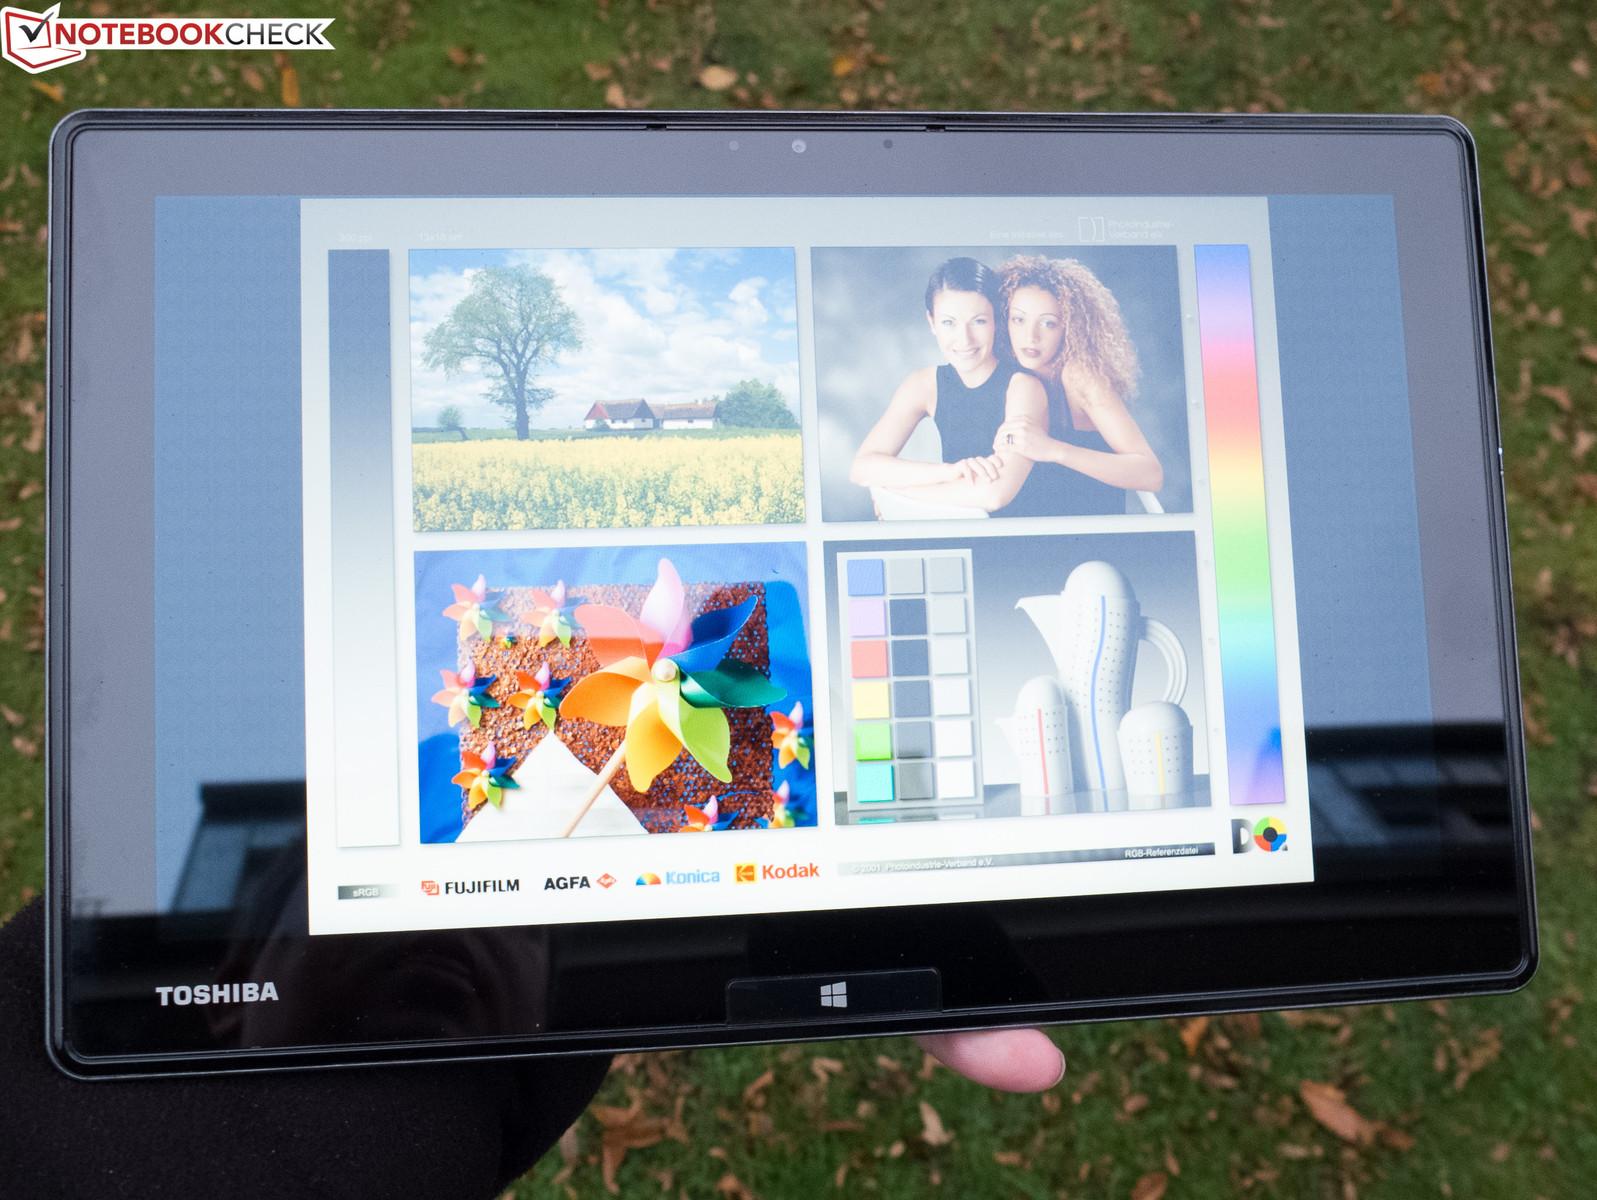 Toshiba WT310 Atheros Bluetooth Windows 7 64-BIT